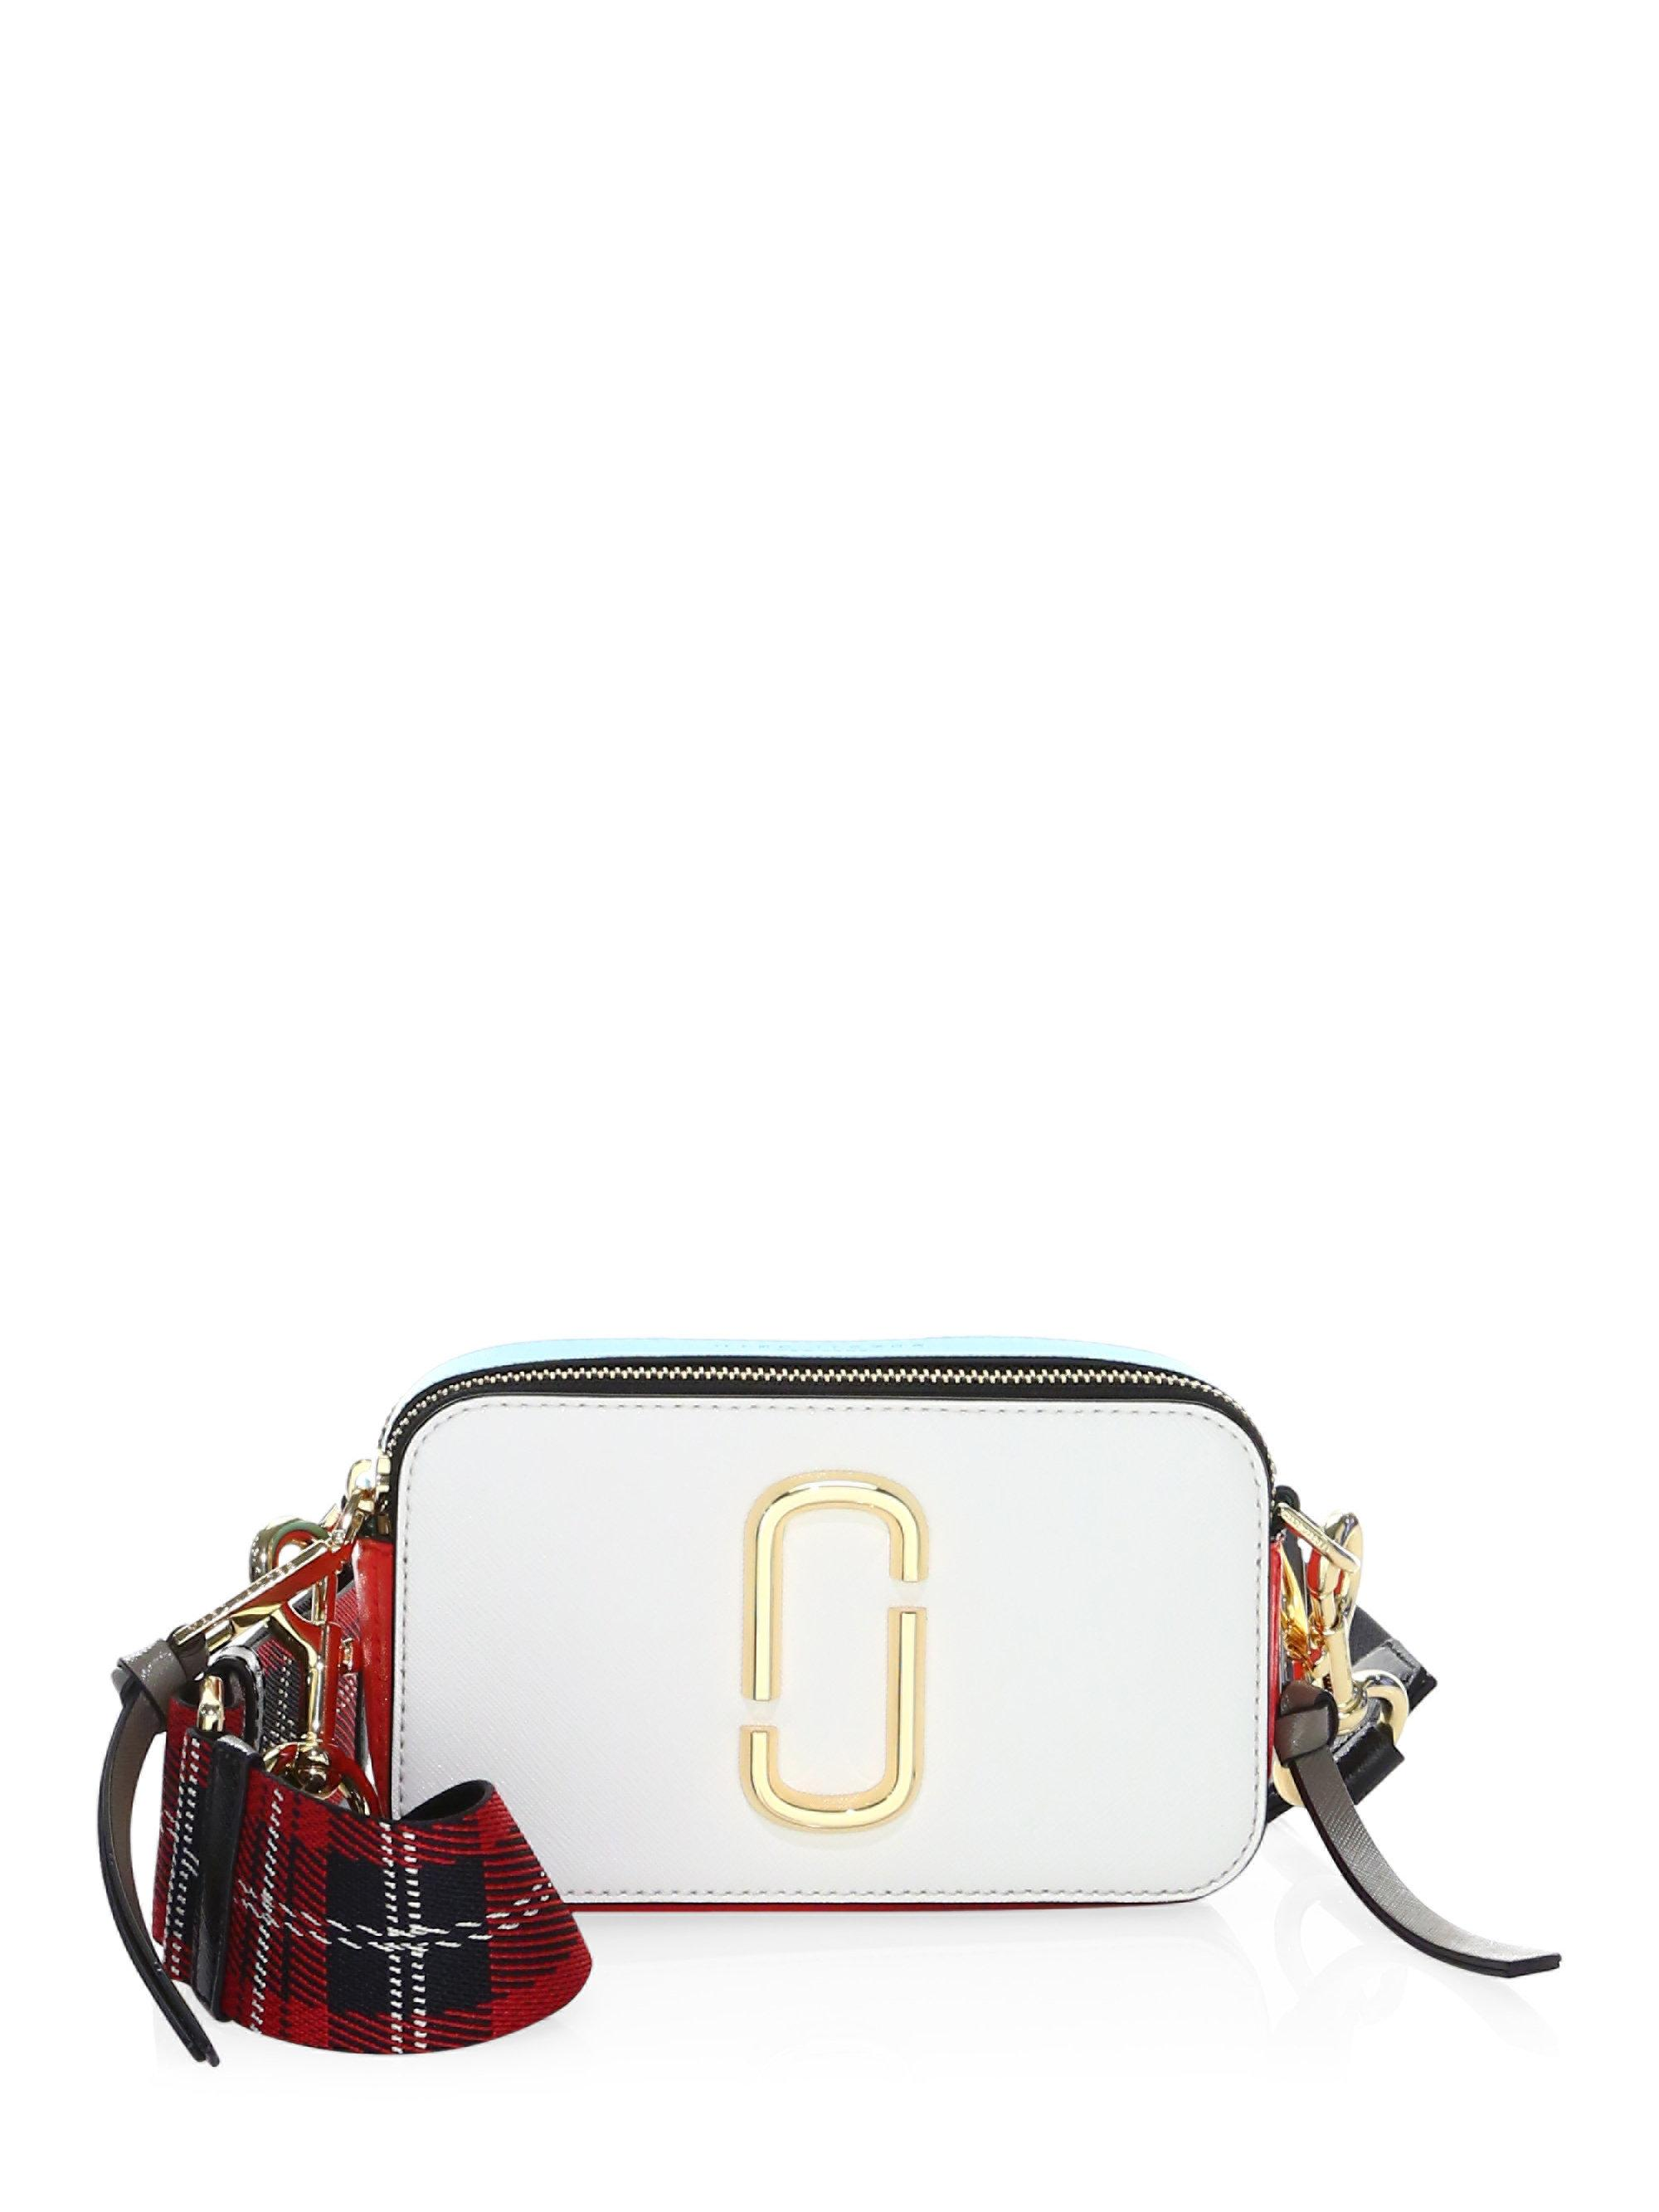 Louis Vuitton Purses At Saks Fifth Avenue Best Purse Image Ccdbb Org